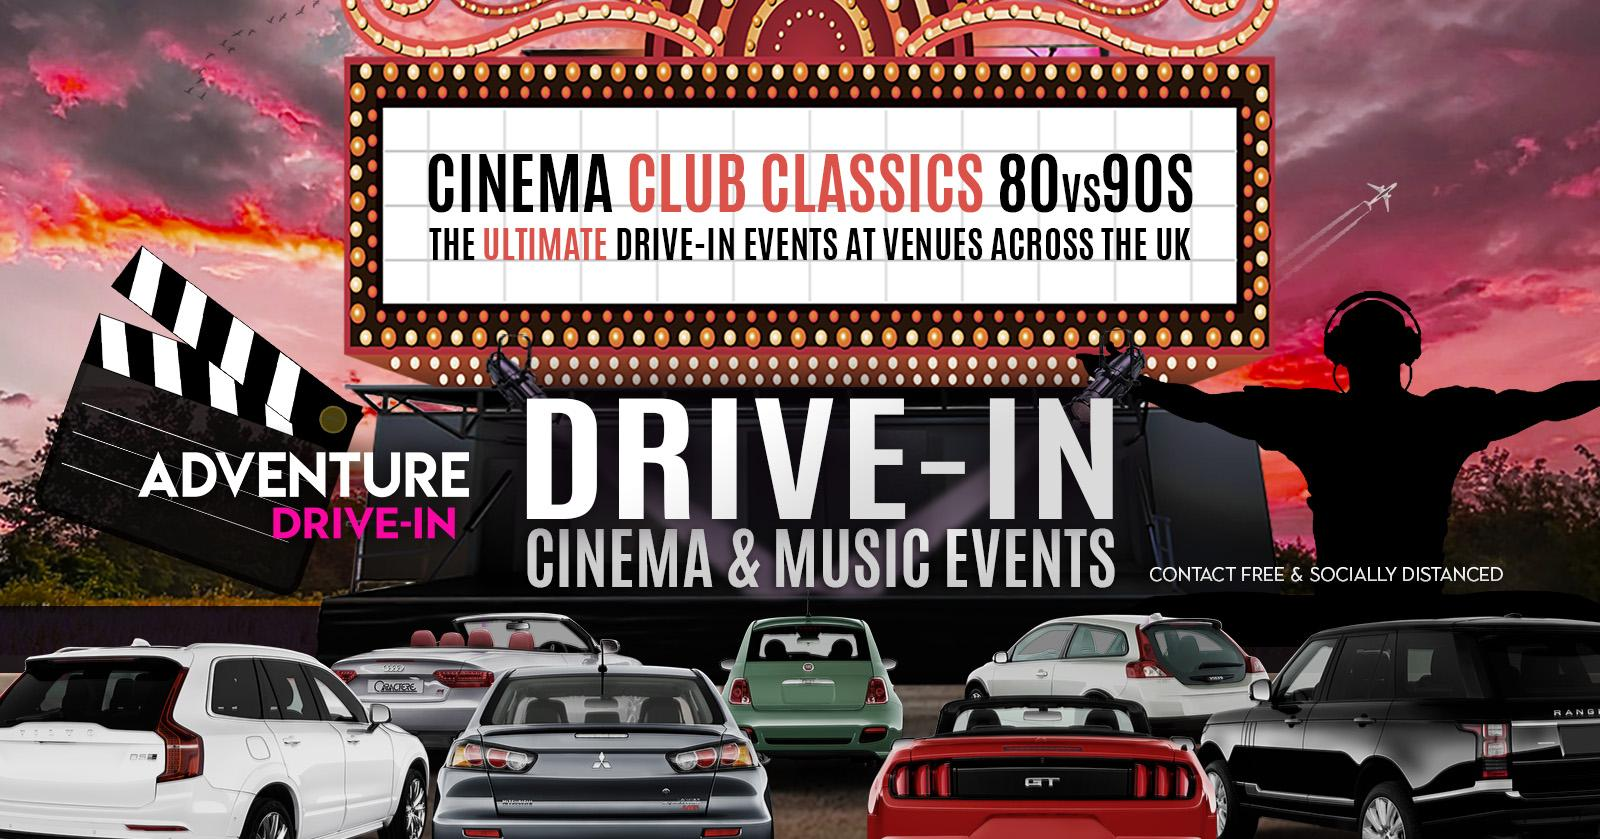 Adventure Drive-In Cinema